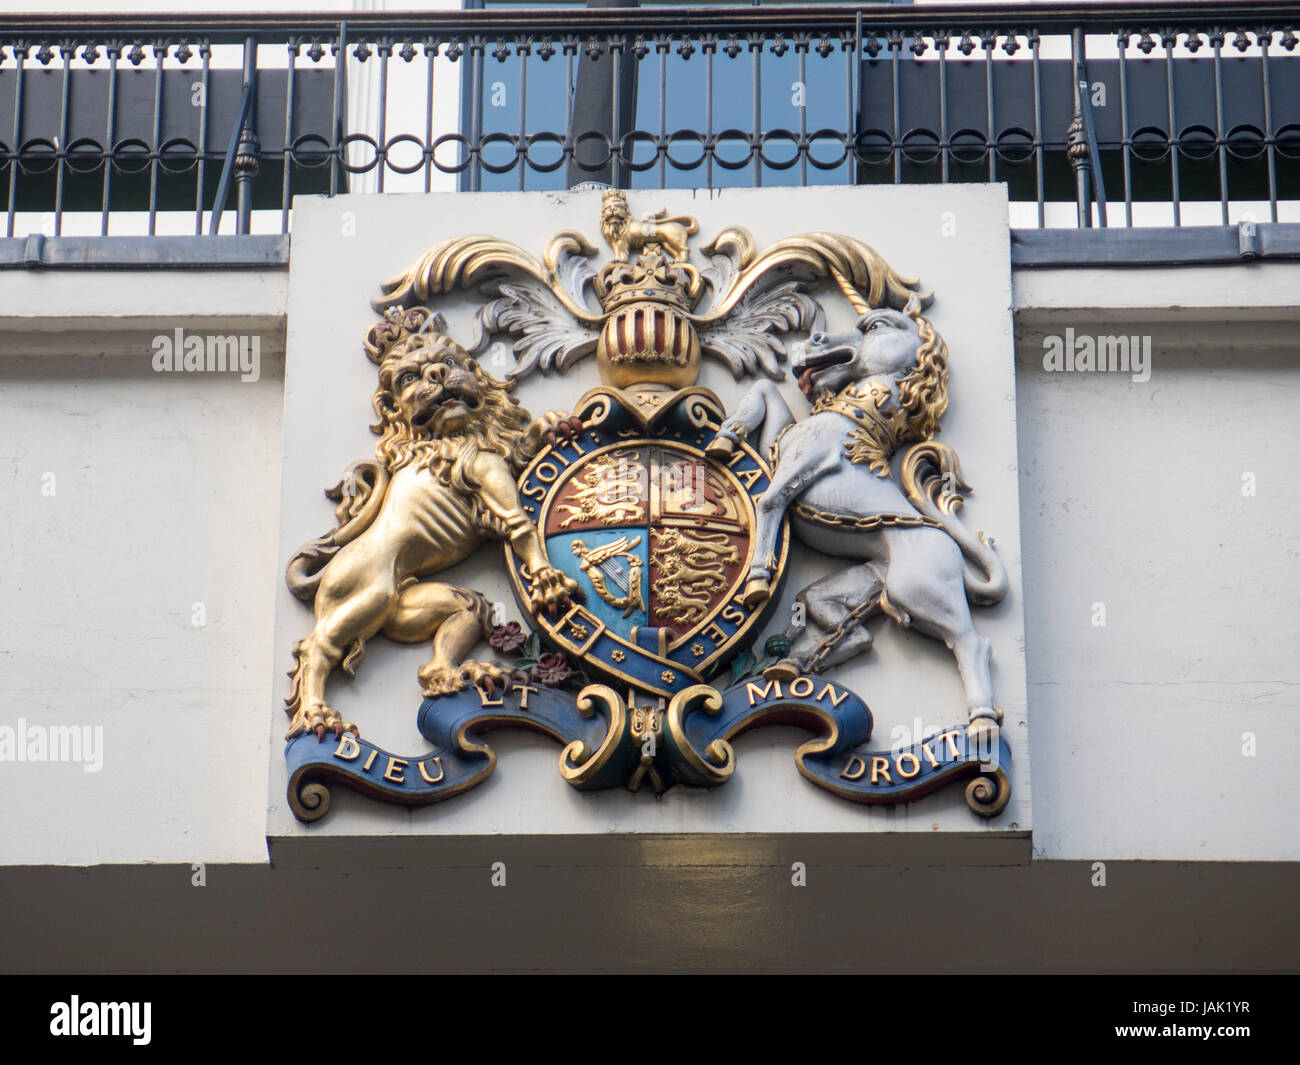 Coat of arms Theatre Royal, Drury Lane - Stock Image